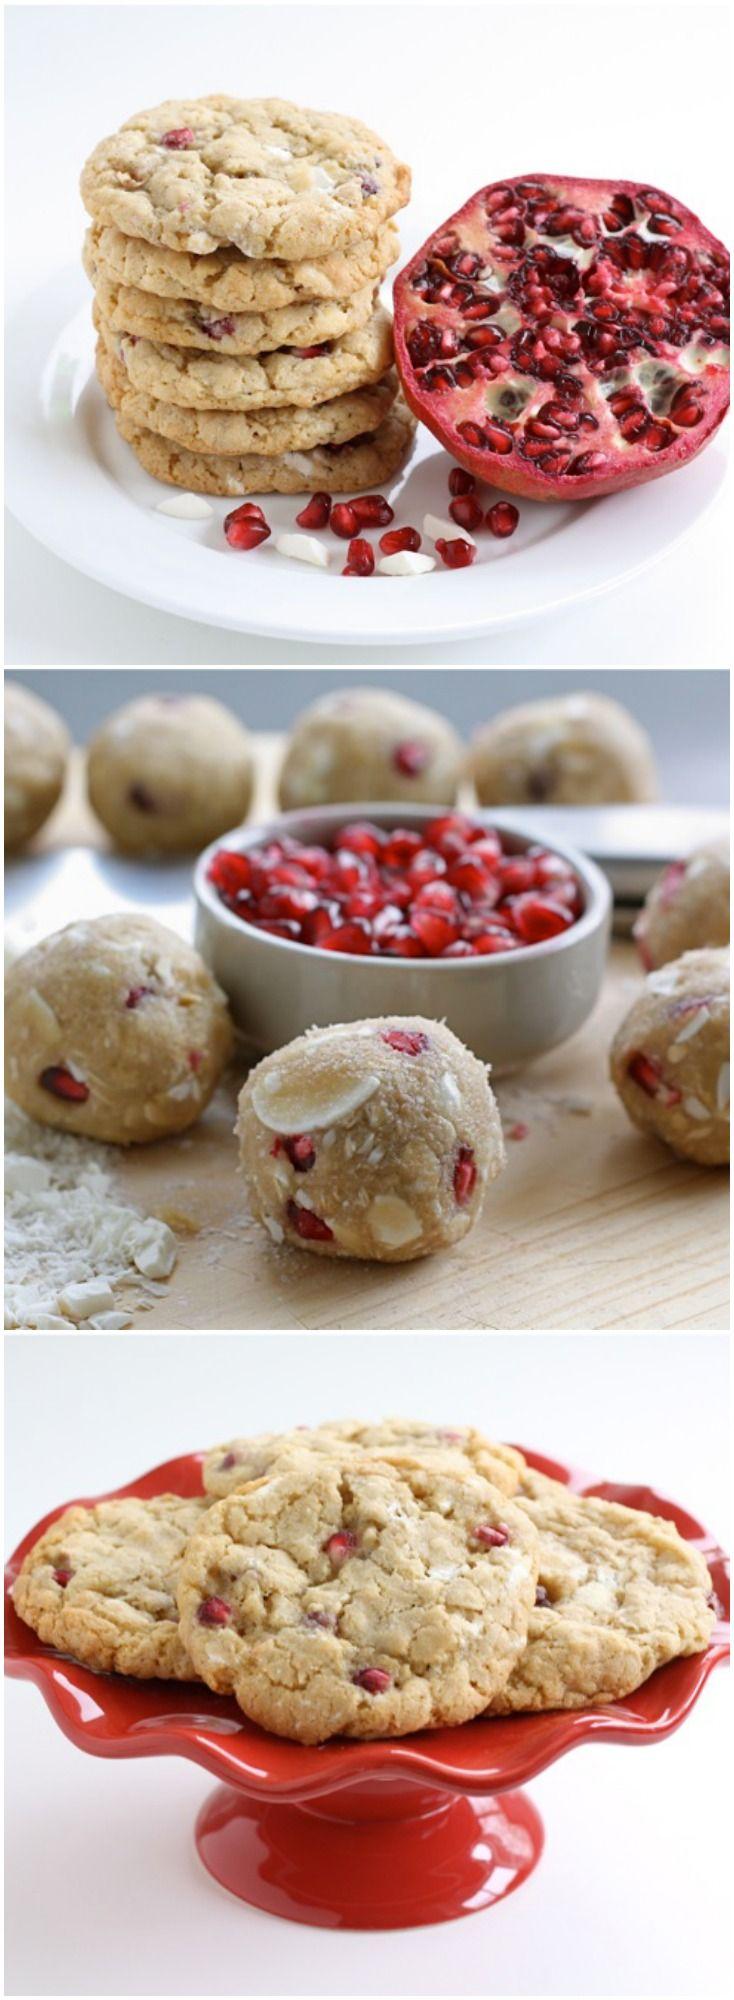 Pomegranate White Chocolate Chunk Cookies | twopeasandtheirpod